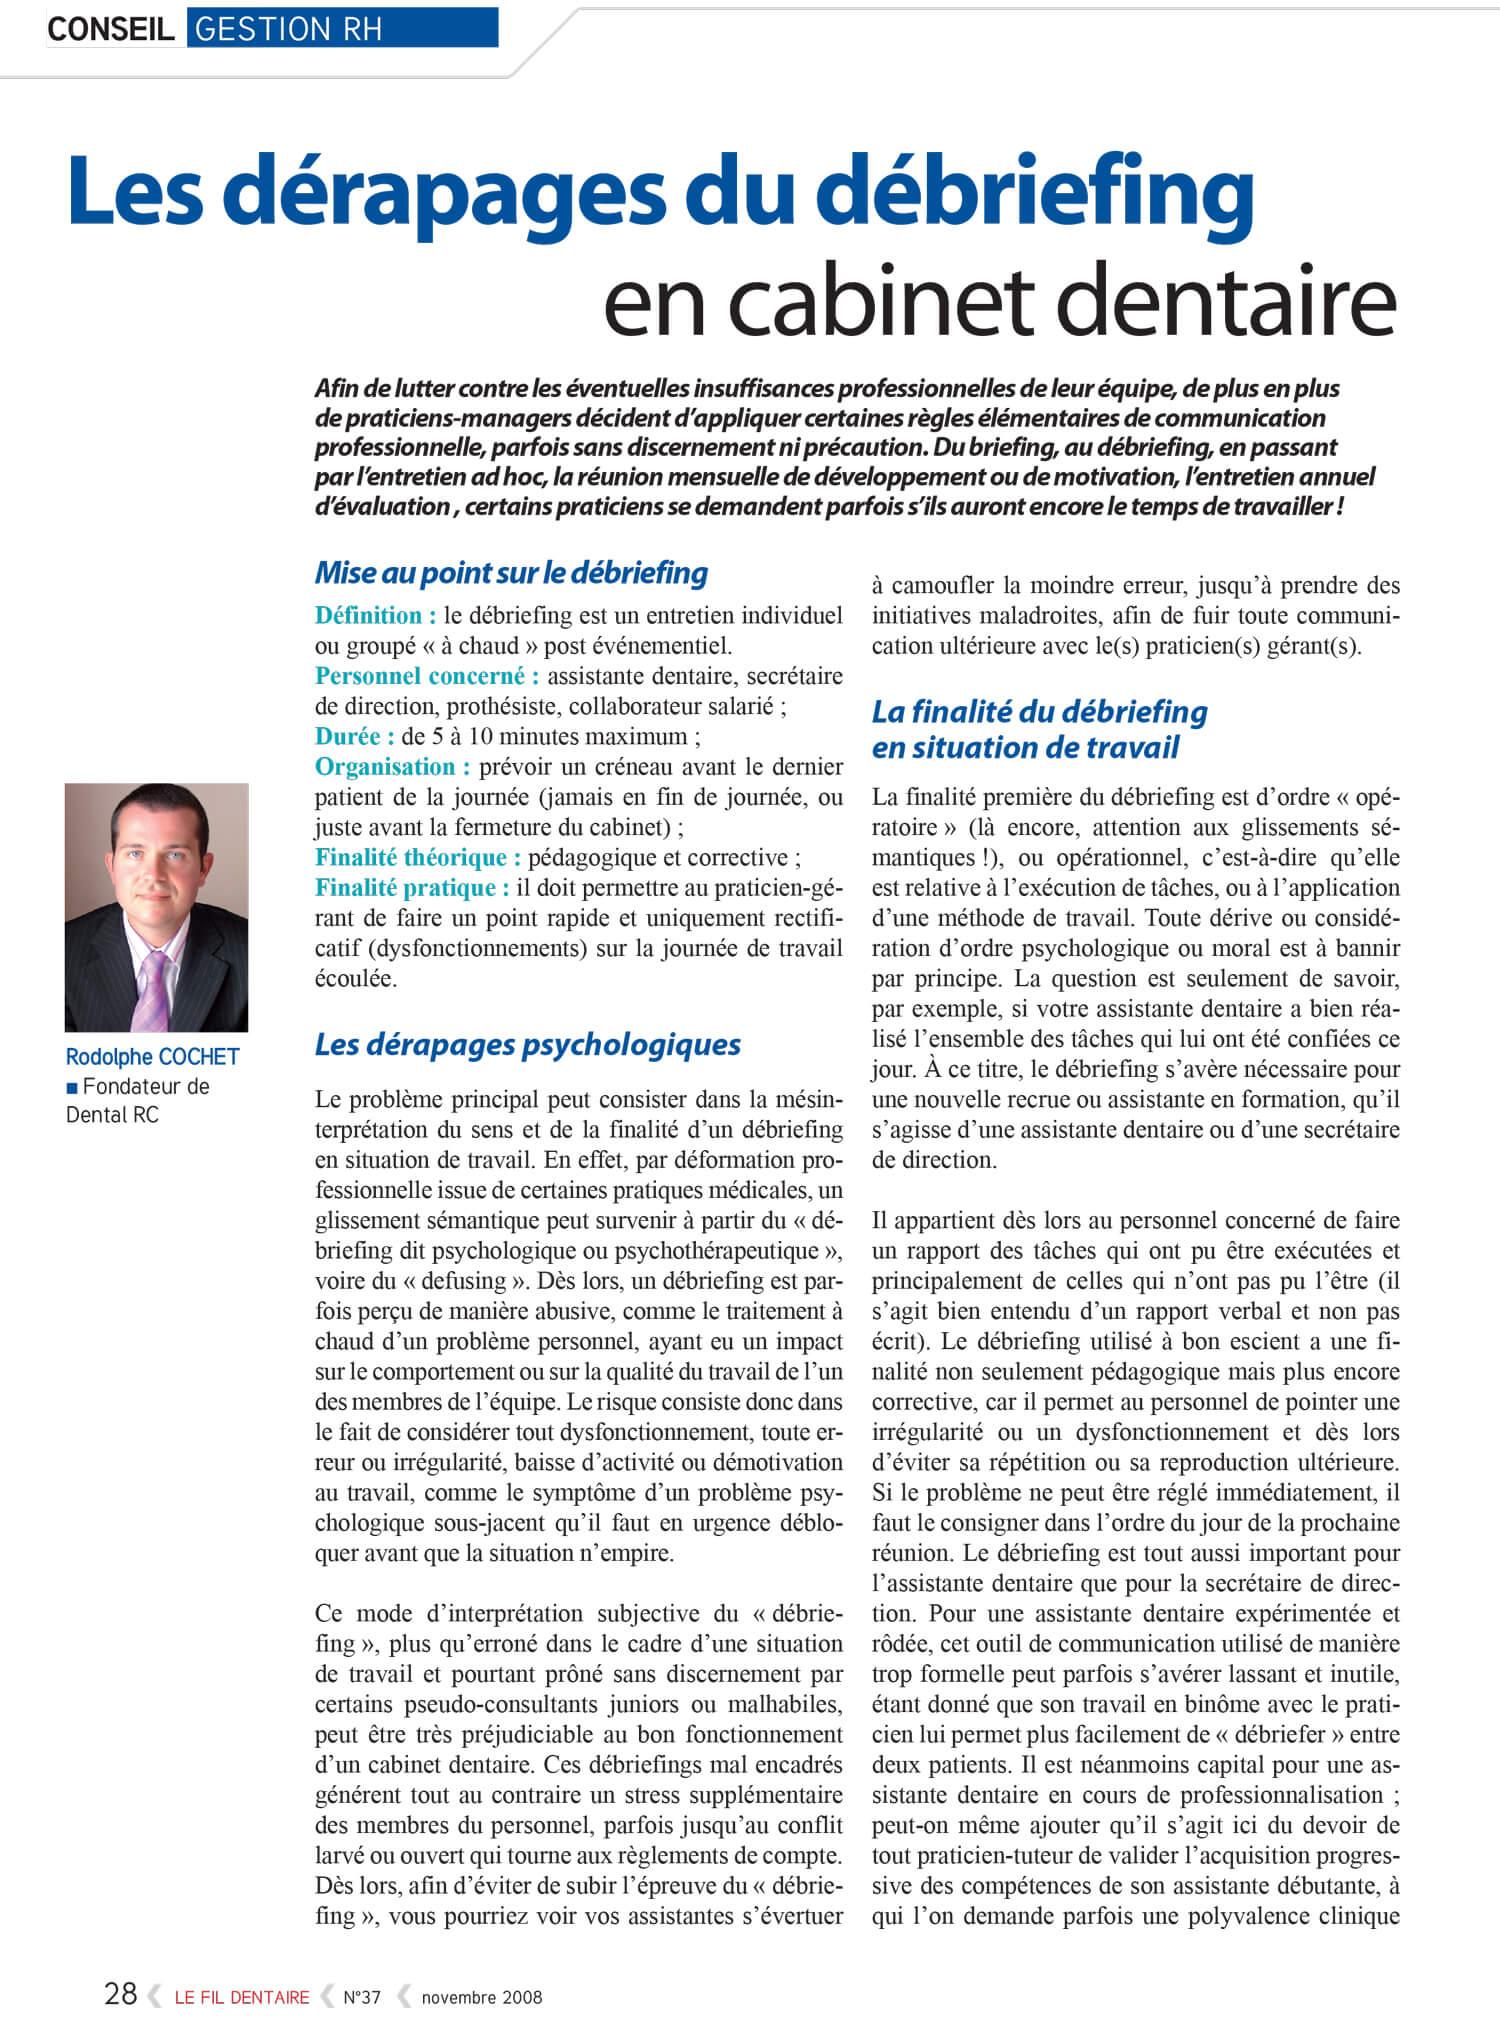 Les_derapages_du_debriefing_cabinet_dentaire_Rodolphe_Cochet.jpg